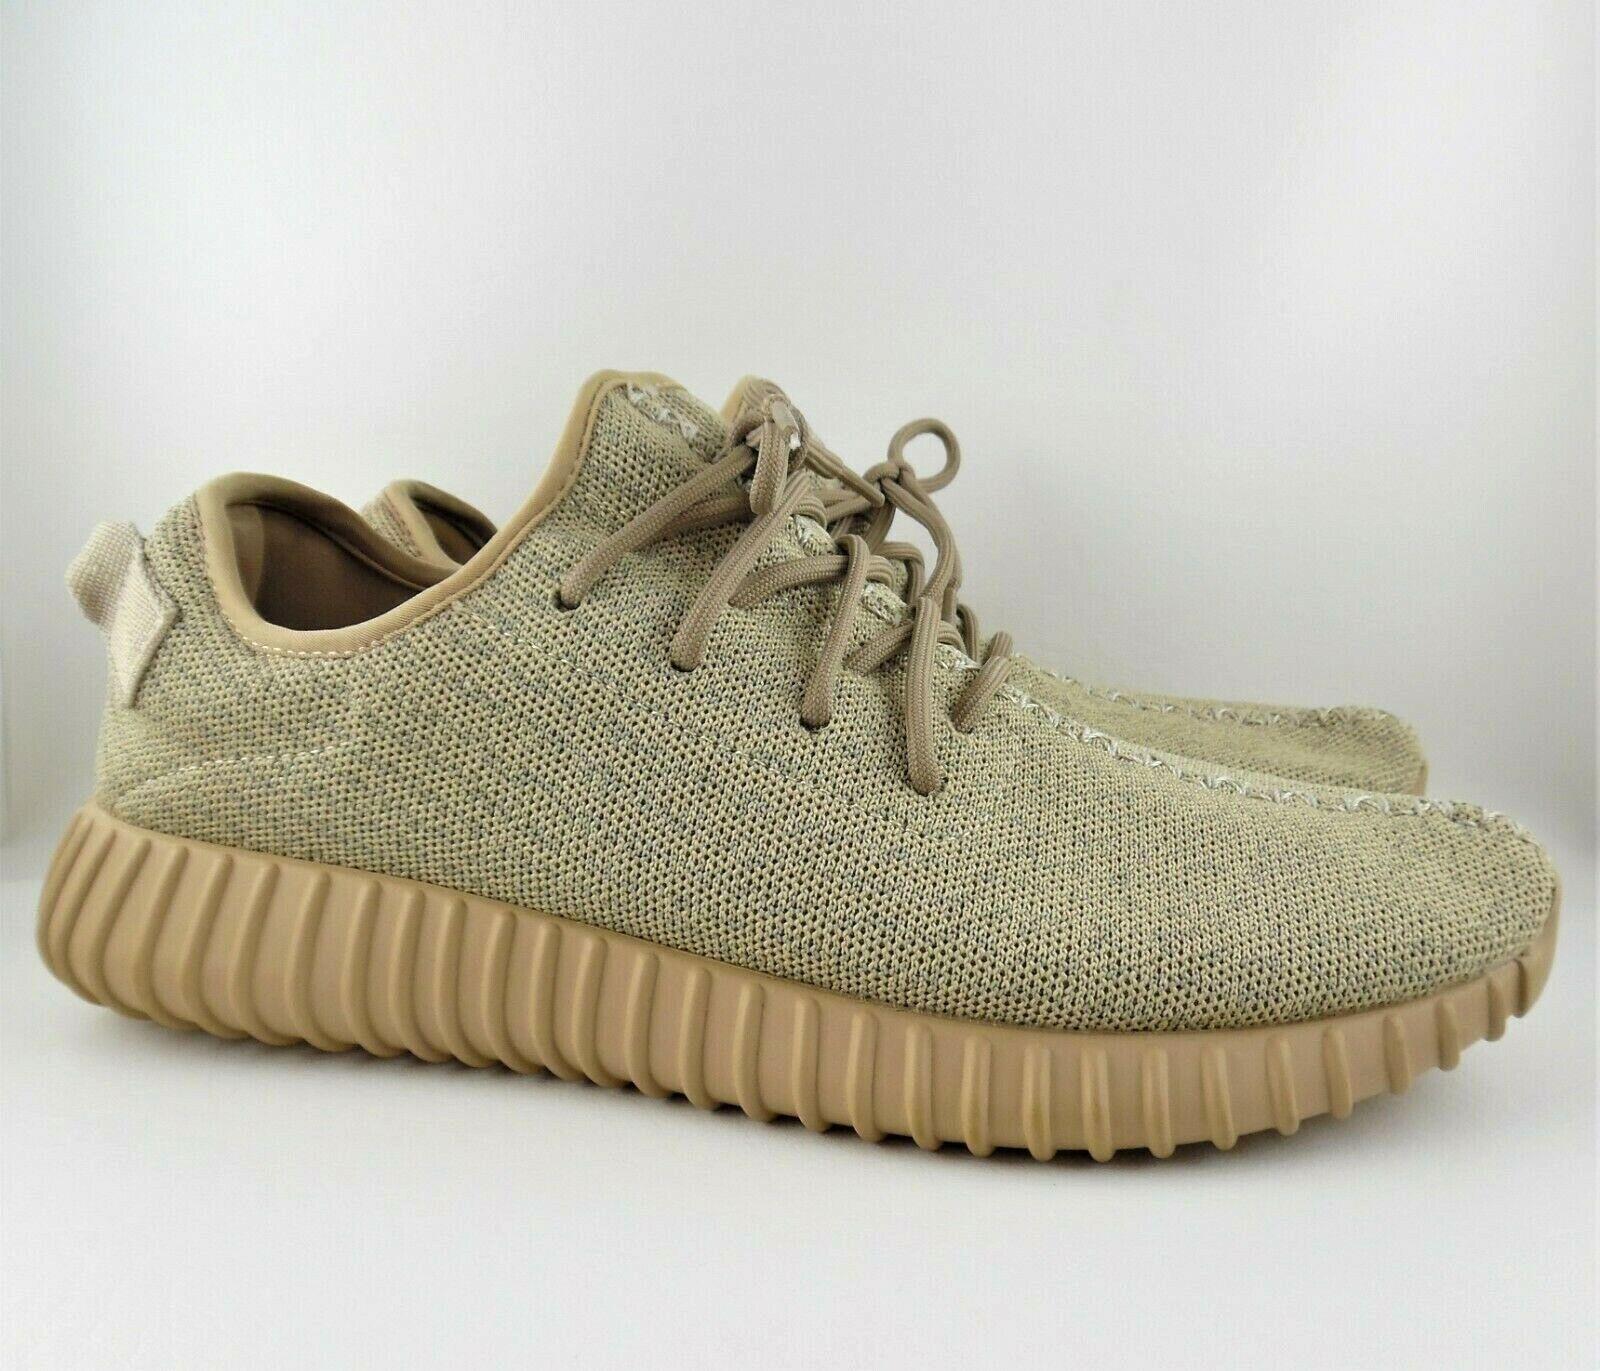 Adidas Yeezy Boost 350 Oxford Tan, AQ2661,  Authentic, US 11,